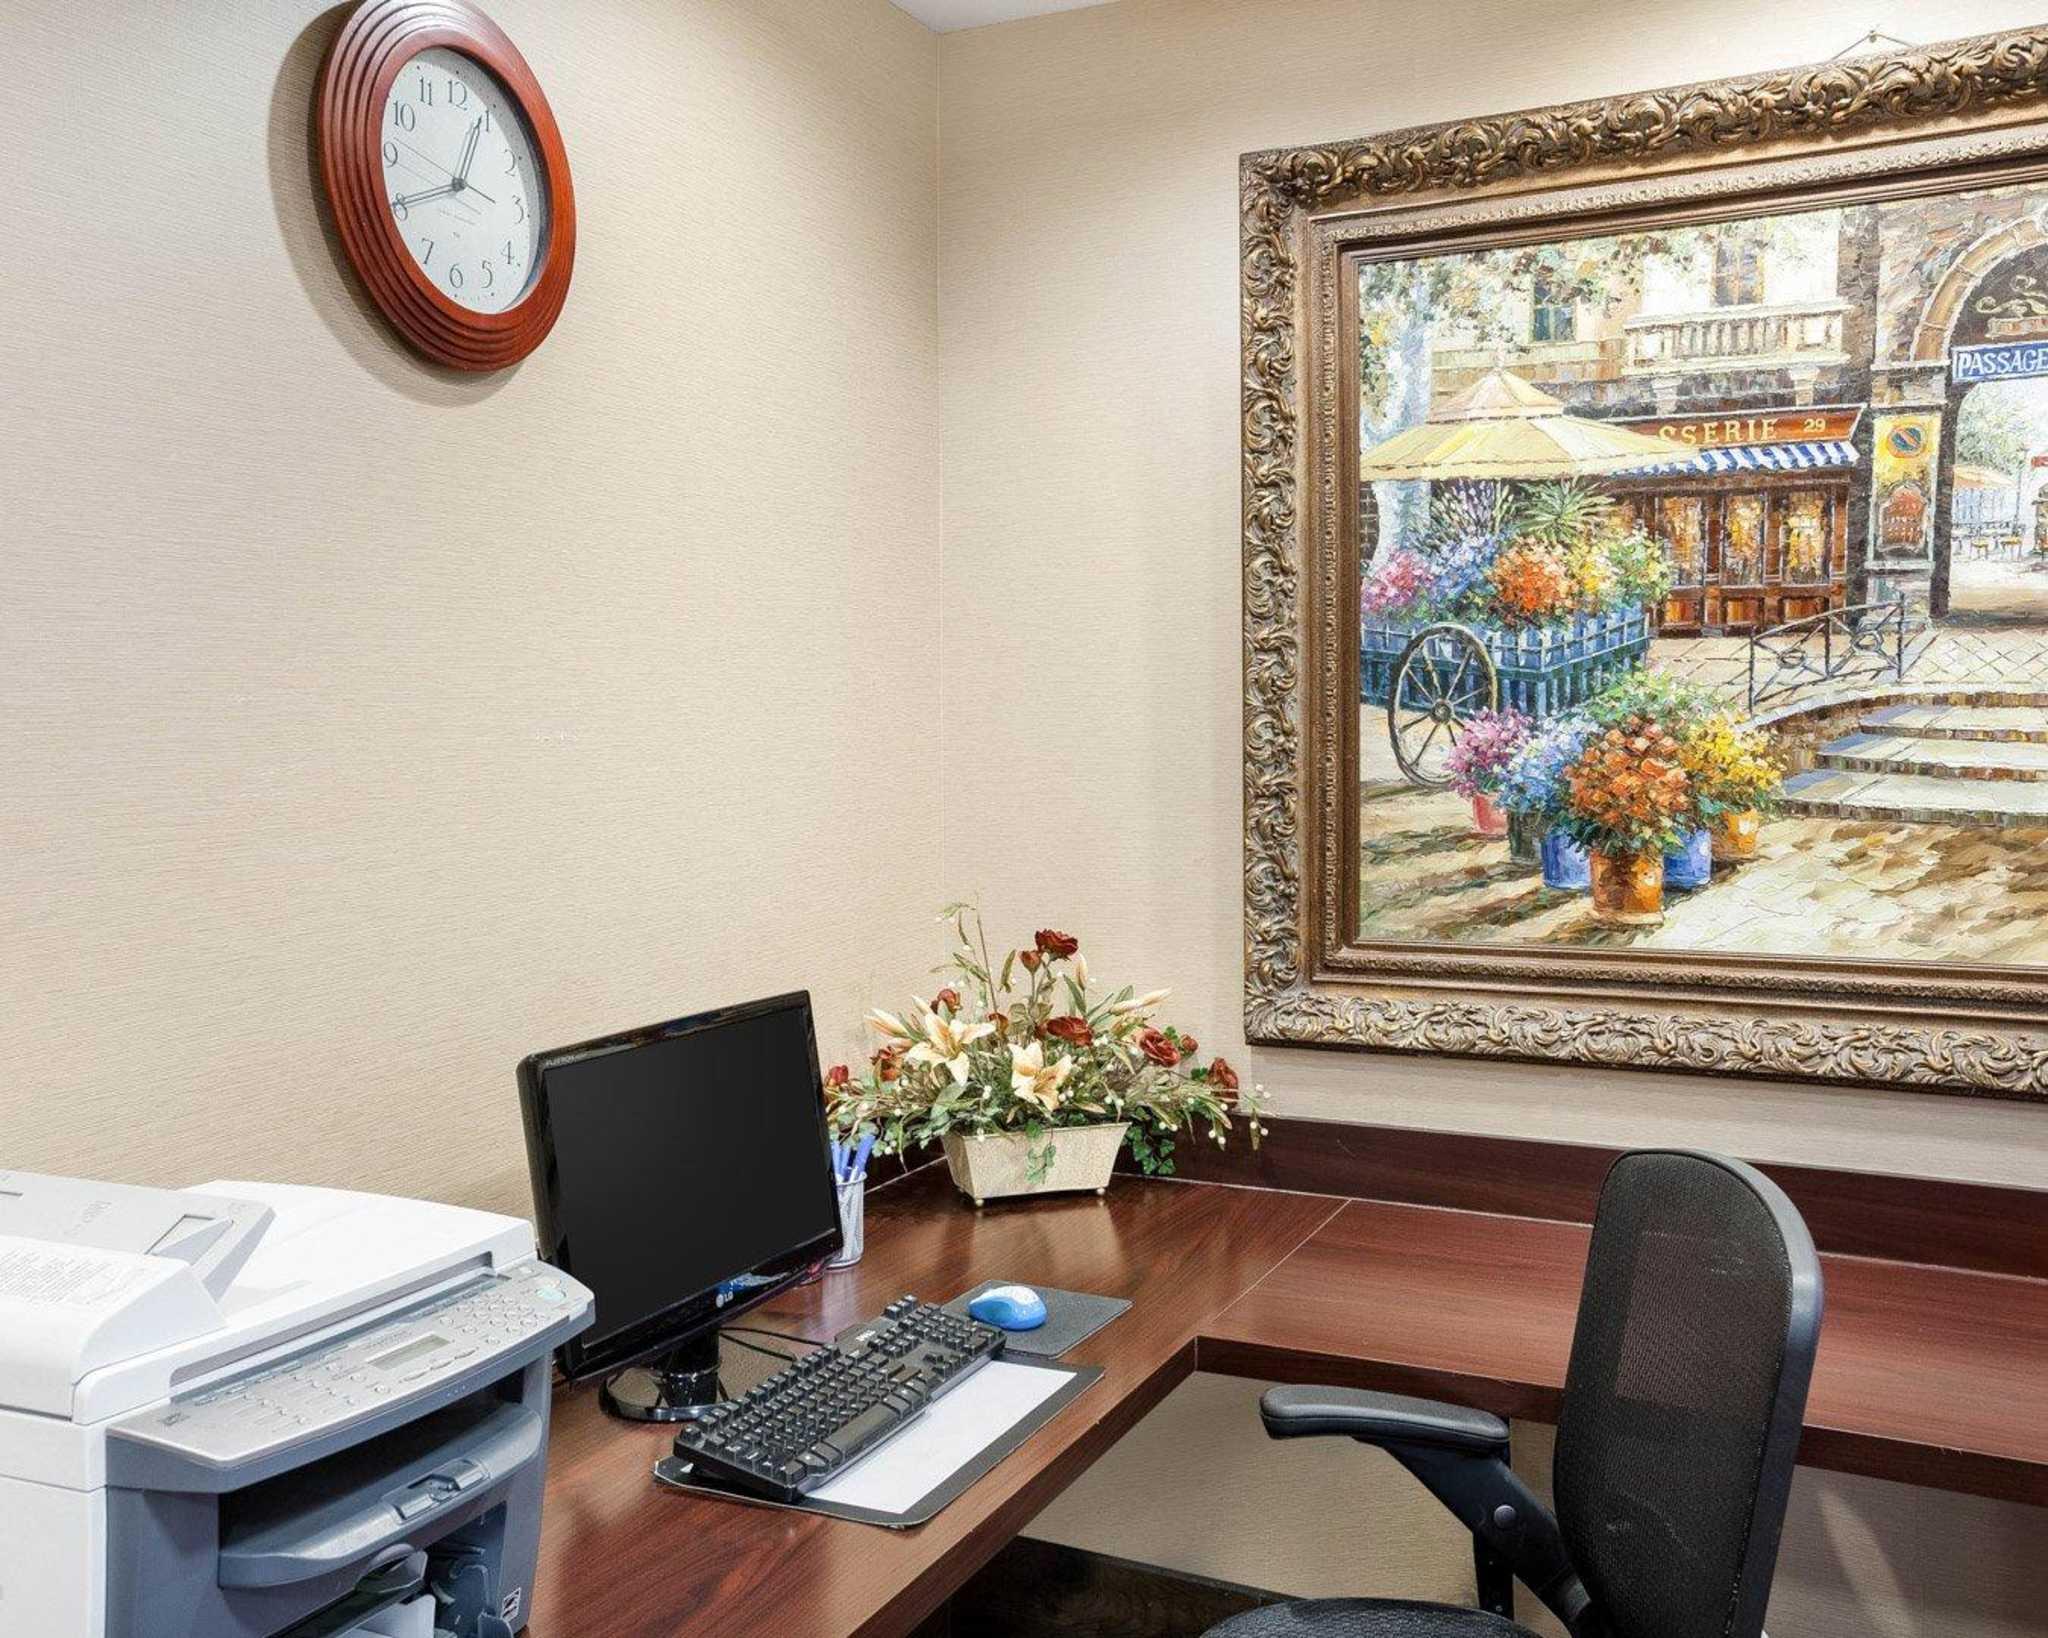 Comfort Inn & Suites Near Medical Center image 32